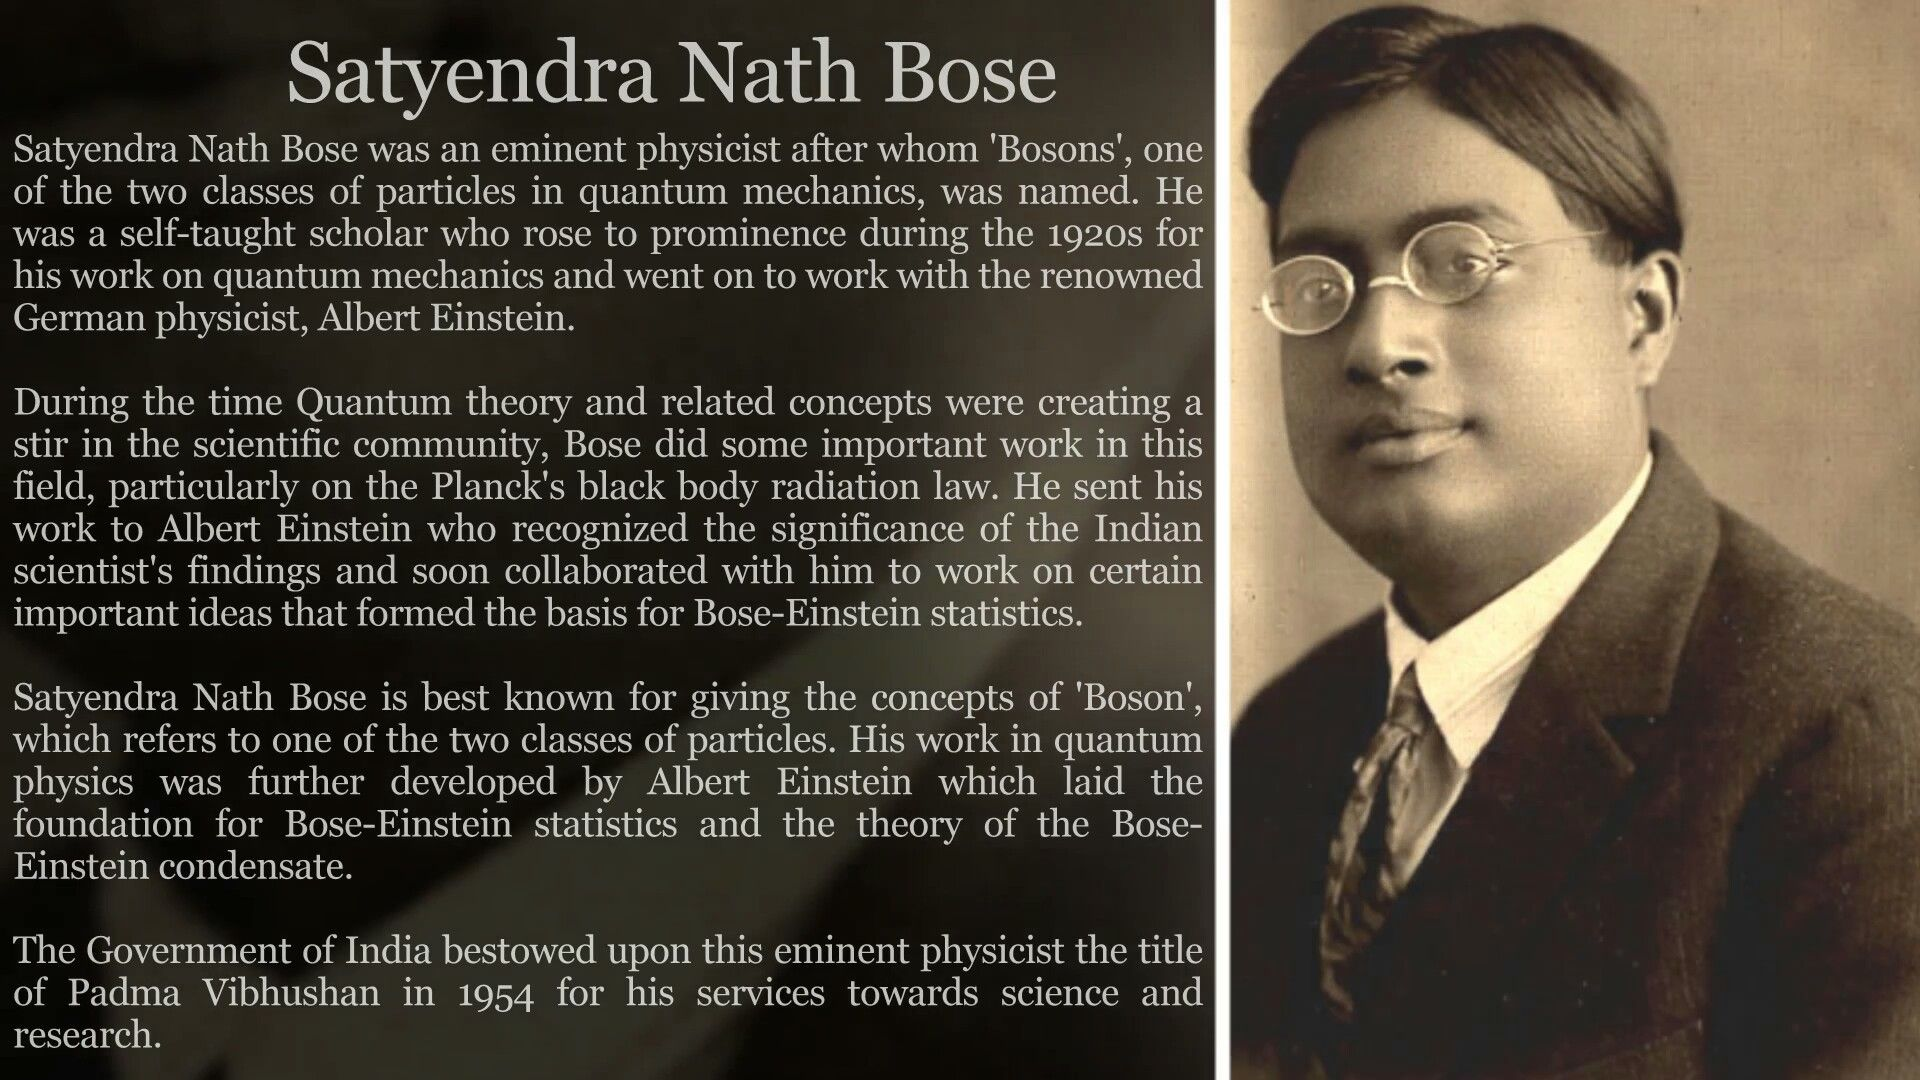 short essay on satyendra nath bose